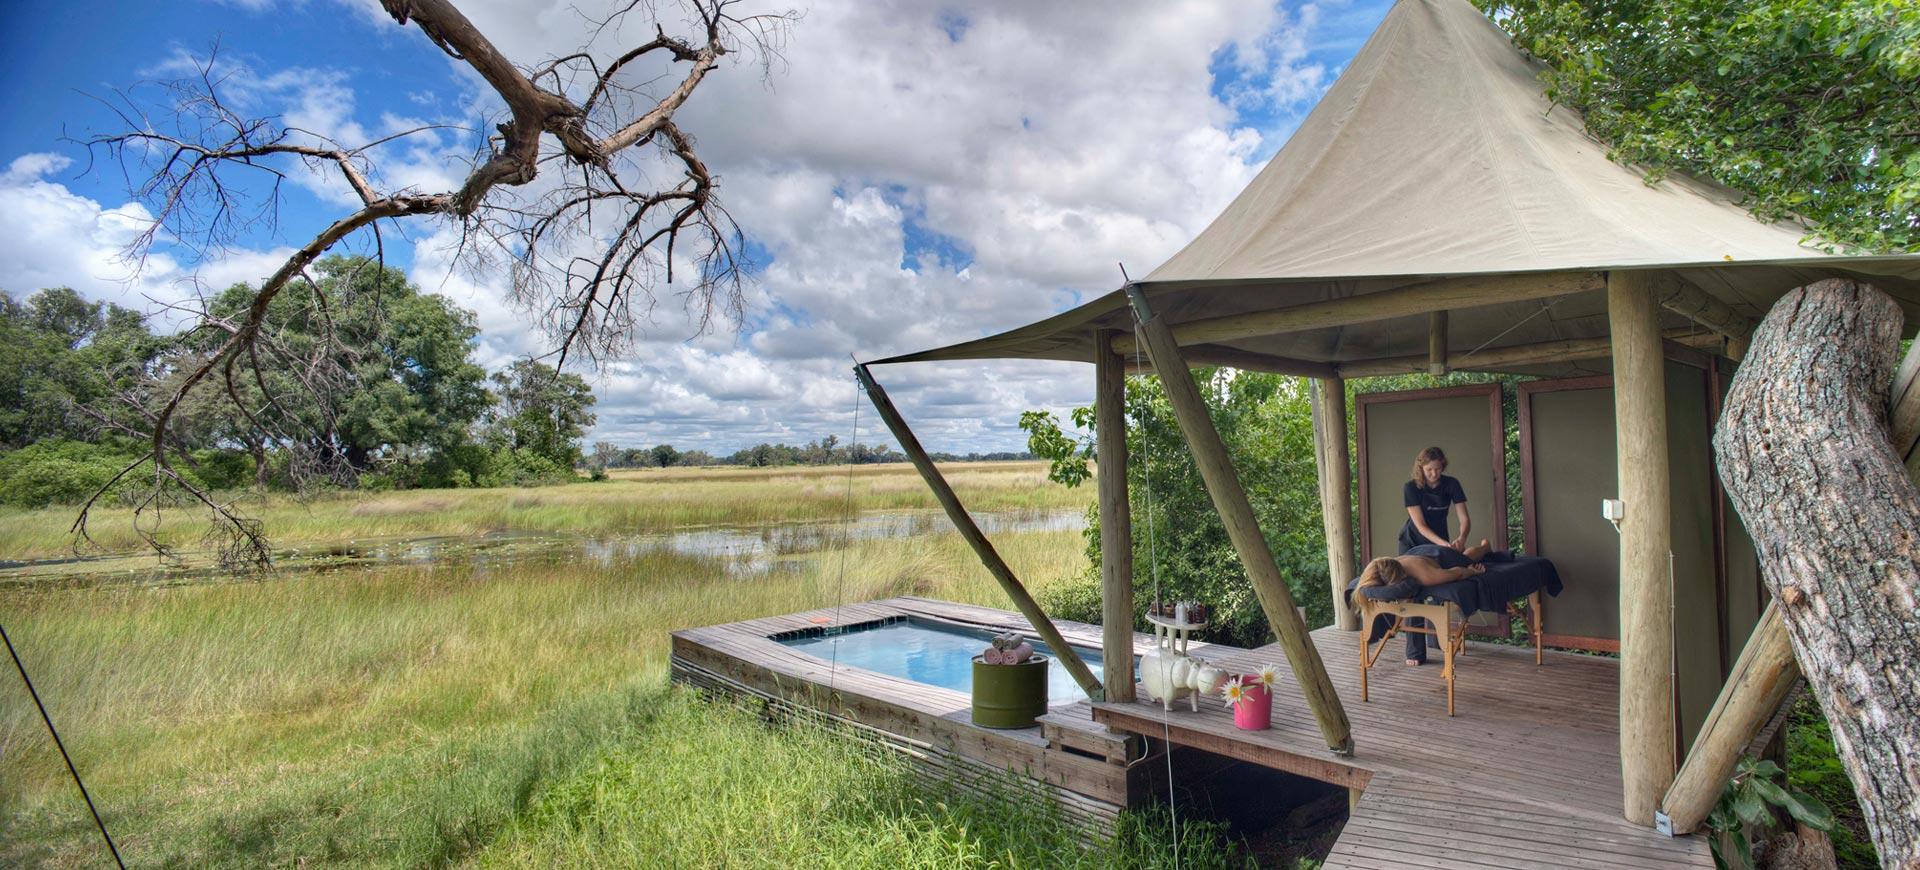 Xaranna Okavango Delta